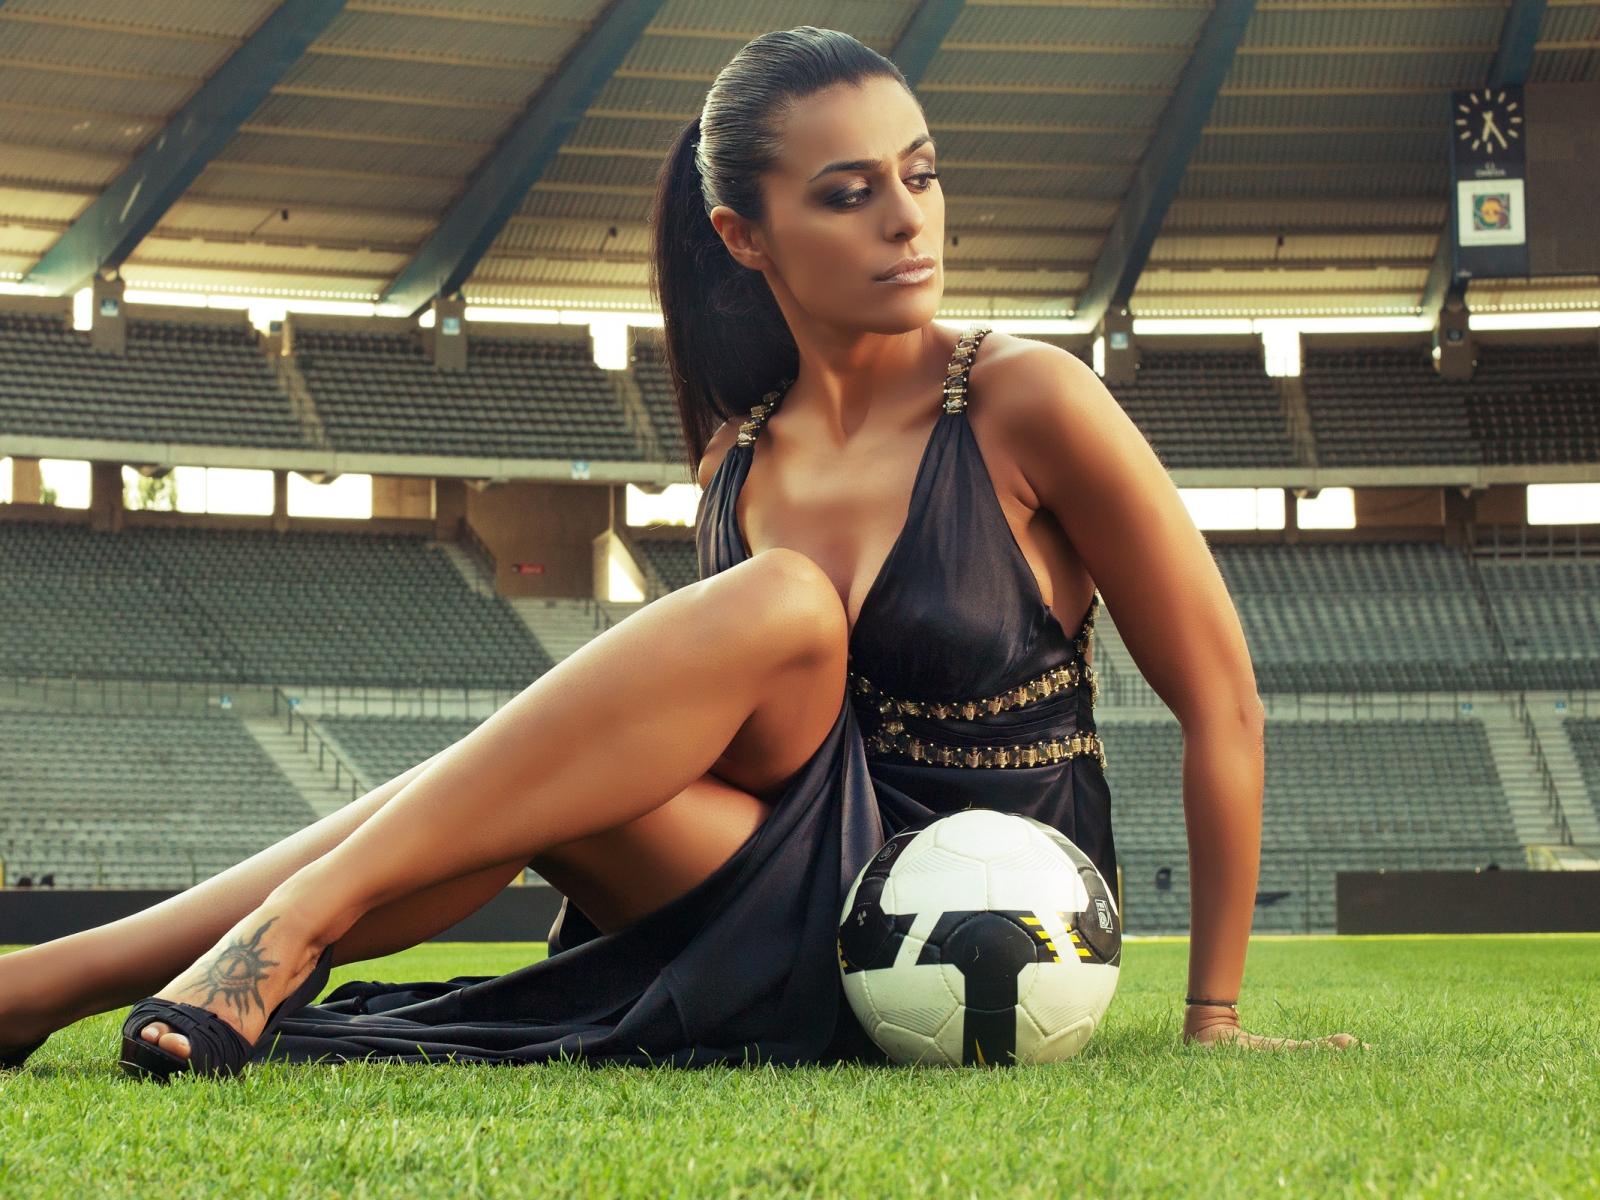 Hd Wallpapers Top 10 Football Girls Wallpapers: Soccer Football Girl With The Ball Stadium HD Desktop